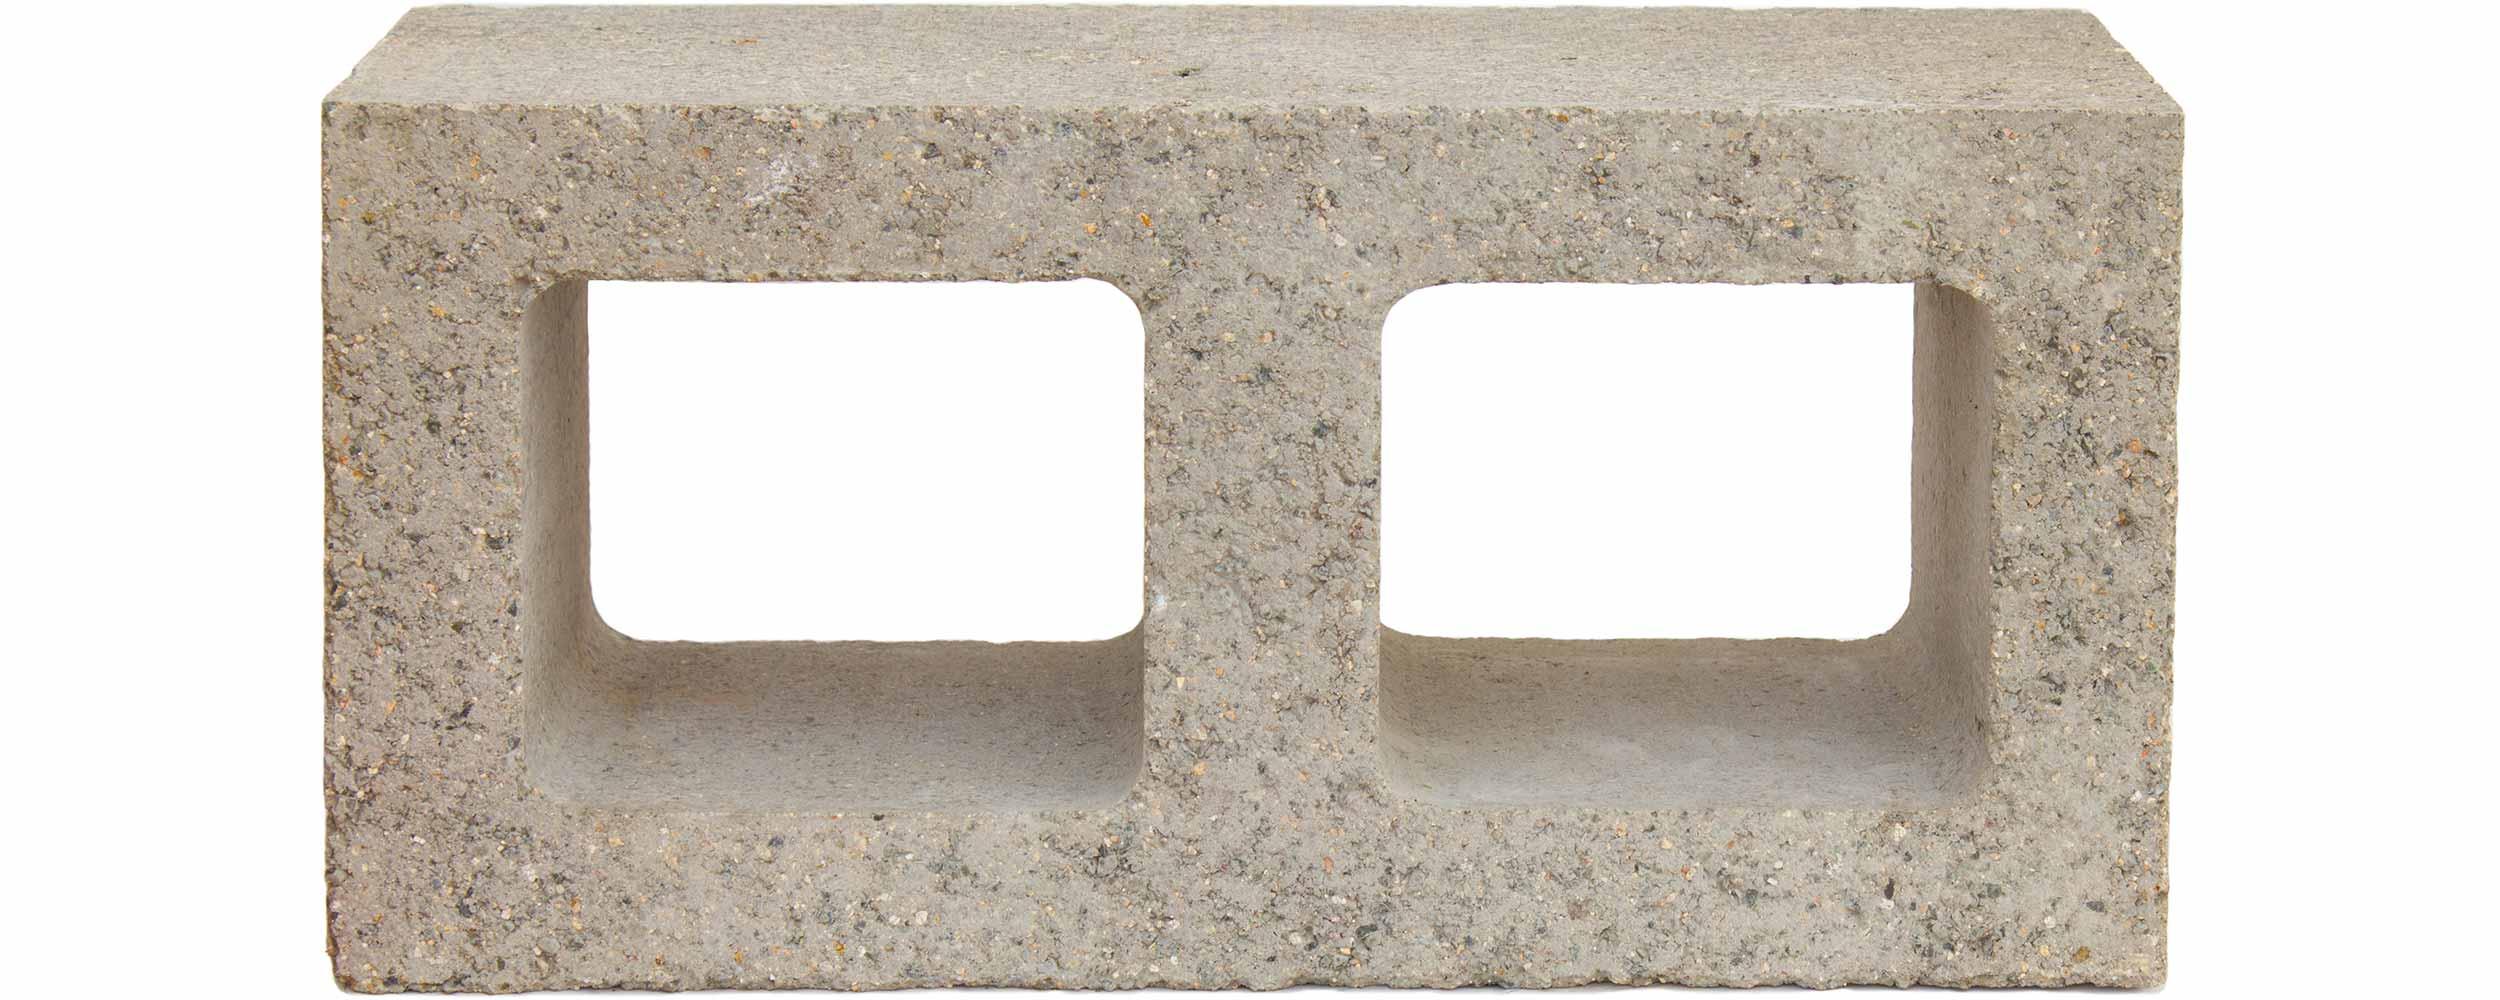 Watershed-Materials-Tan-Watershed-Block-2-2500.jpg